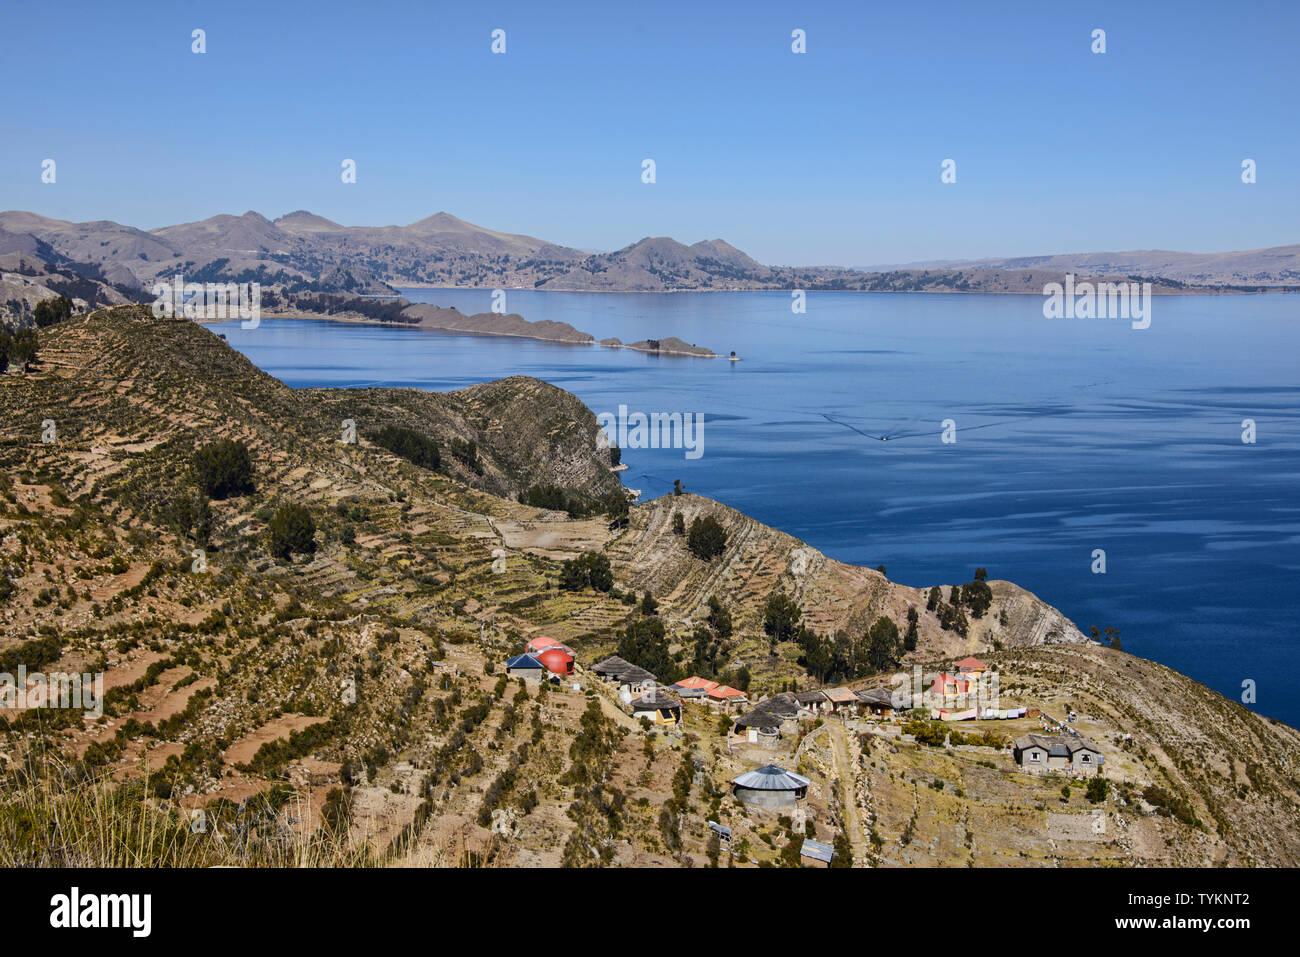 Traditional Inca terracing on Isla del Sol, Lake Titicaca, Bolivia Stock Photo